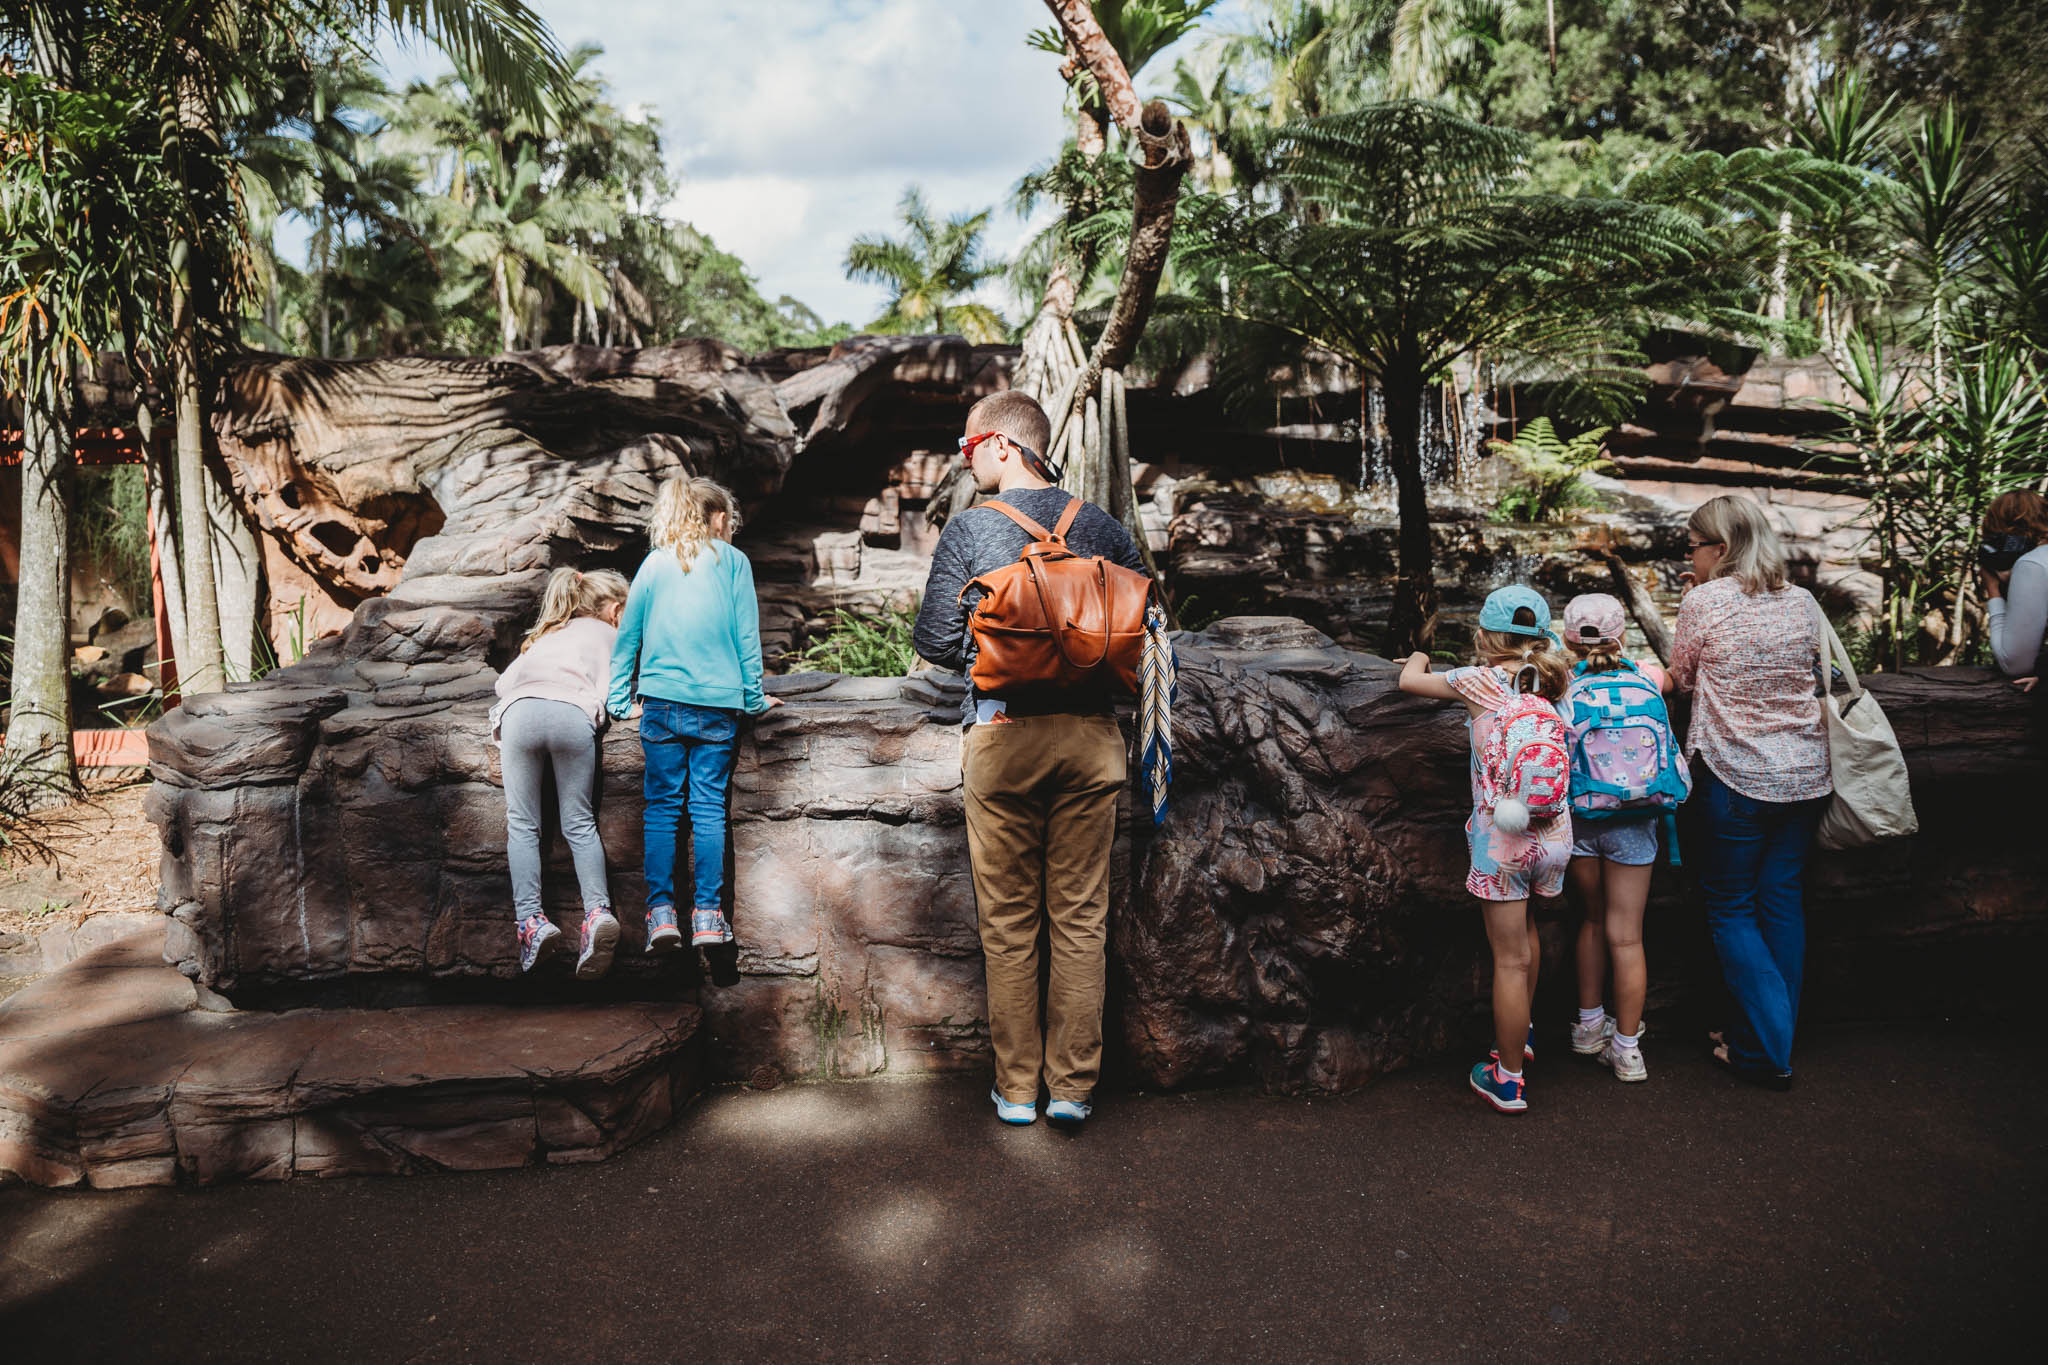 Australia Zoo-8289.jpg